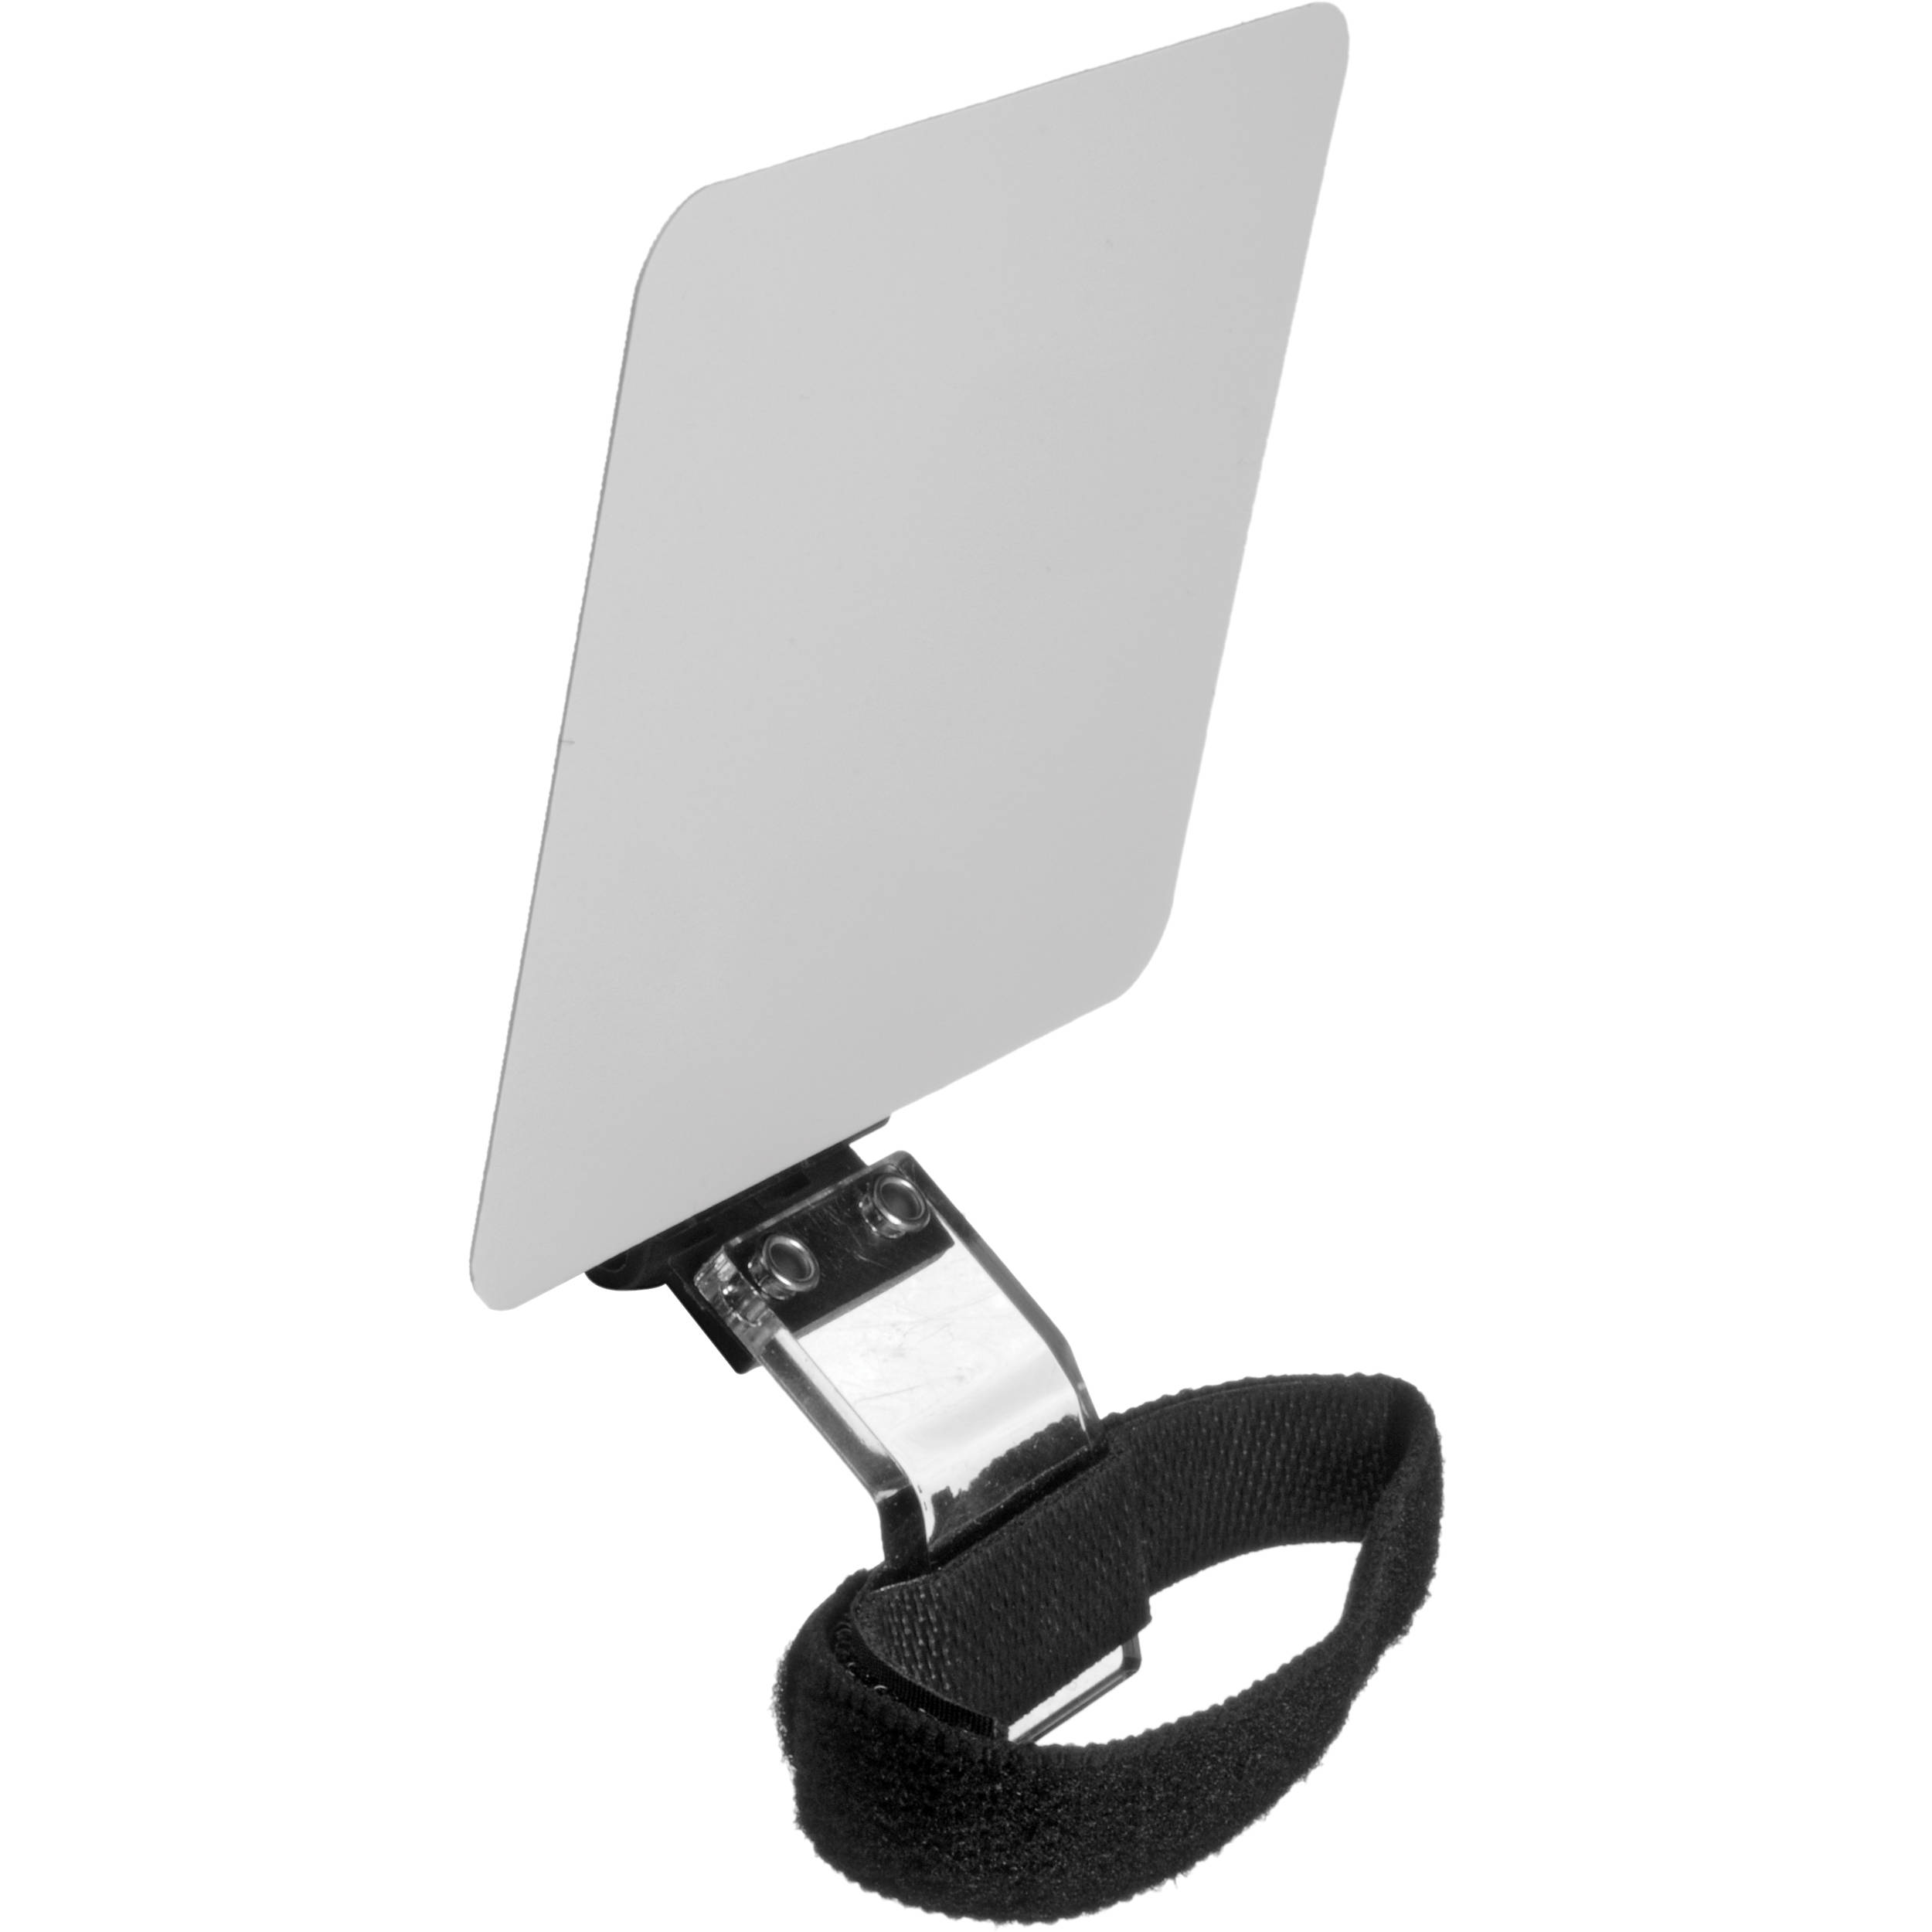 Https C Product 832419 Reg Attachments 121372684979and80schematicjpg 185 Mb Demb Bgfi Big Flip It Reflector 833254